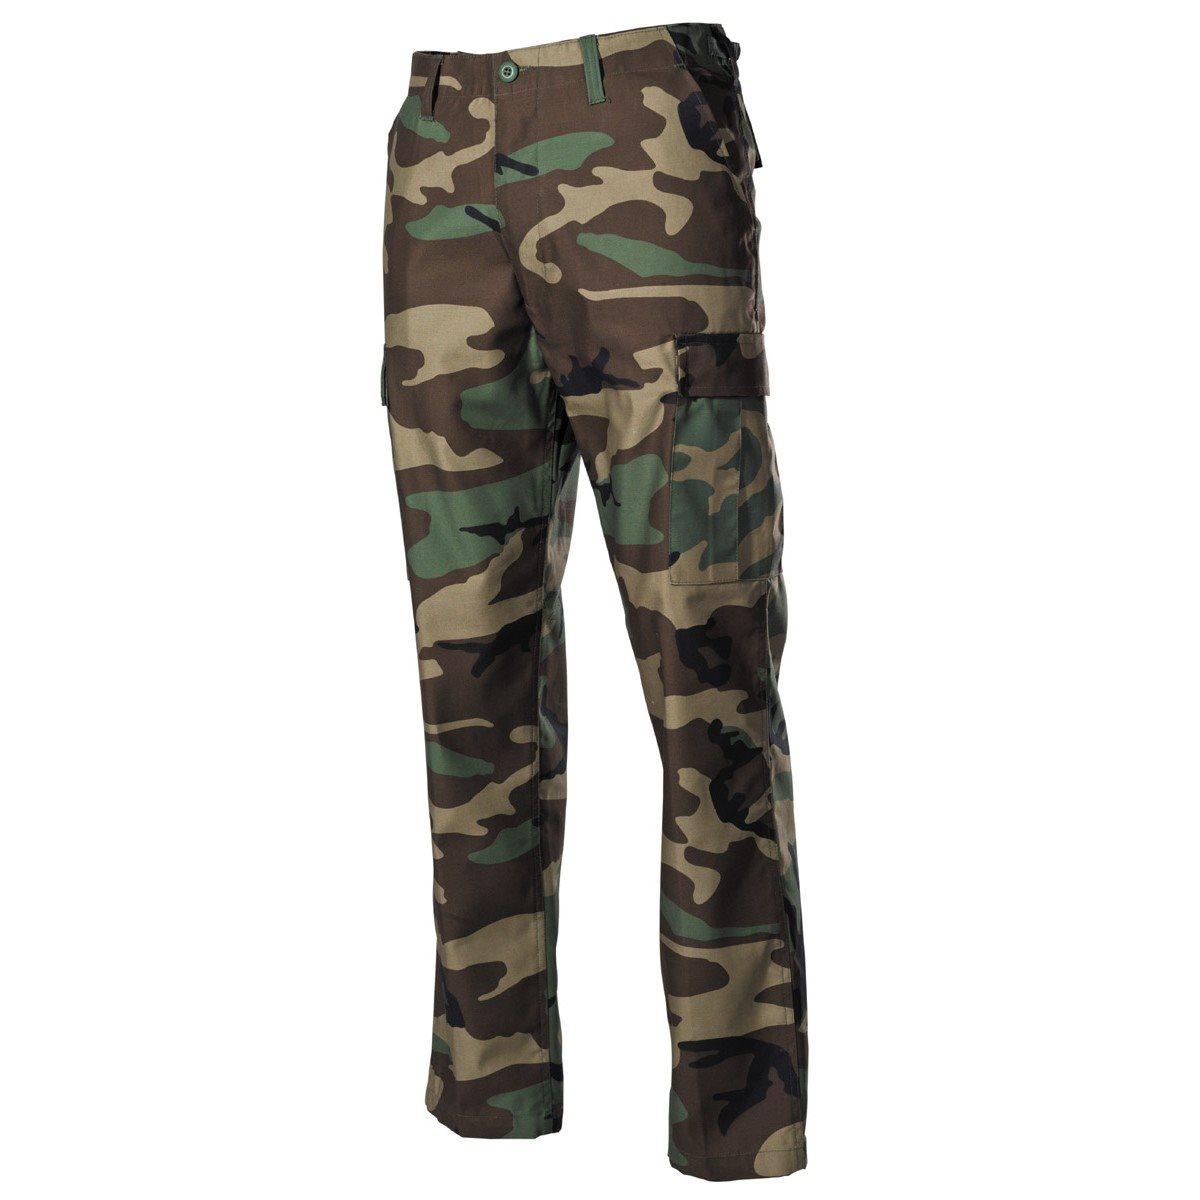 MFH int. comp. | Kalhoty US střih BDU WOODLAND vel.XL